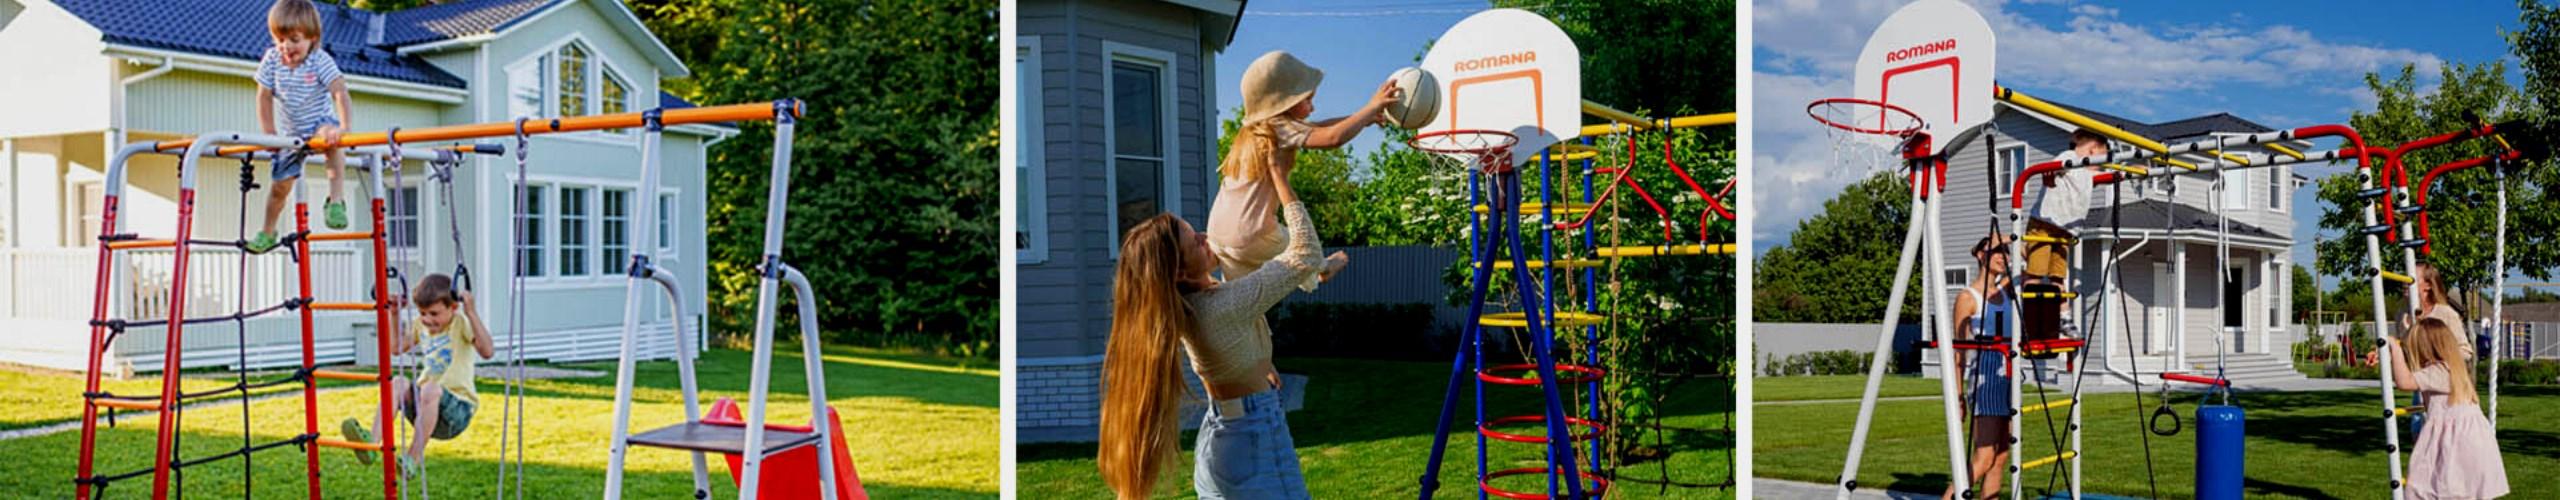 complexe-de-joaca-pentru-copii-exterior-si-interior